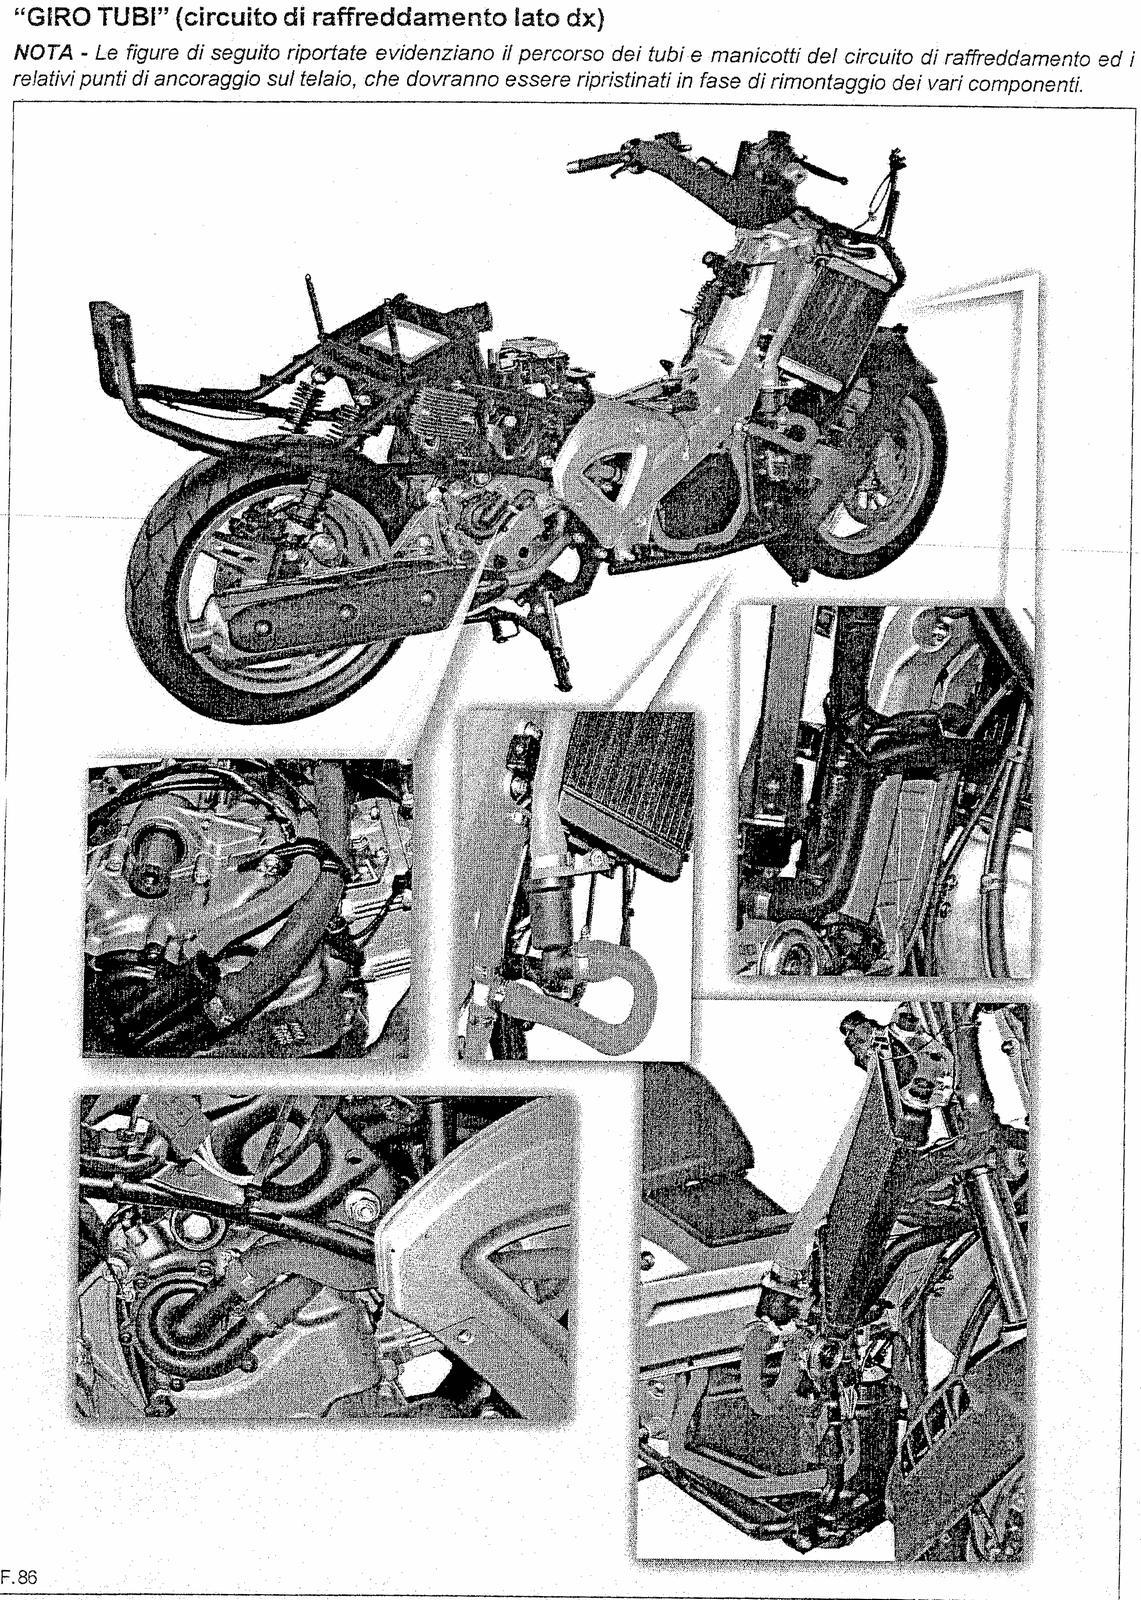 Malaguti Engine Schematics Wiring Diagrams Vt365 Diagram Spidermax Gt500 Weep Hole And Water Pump Seal Vt 365 Schematic